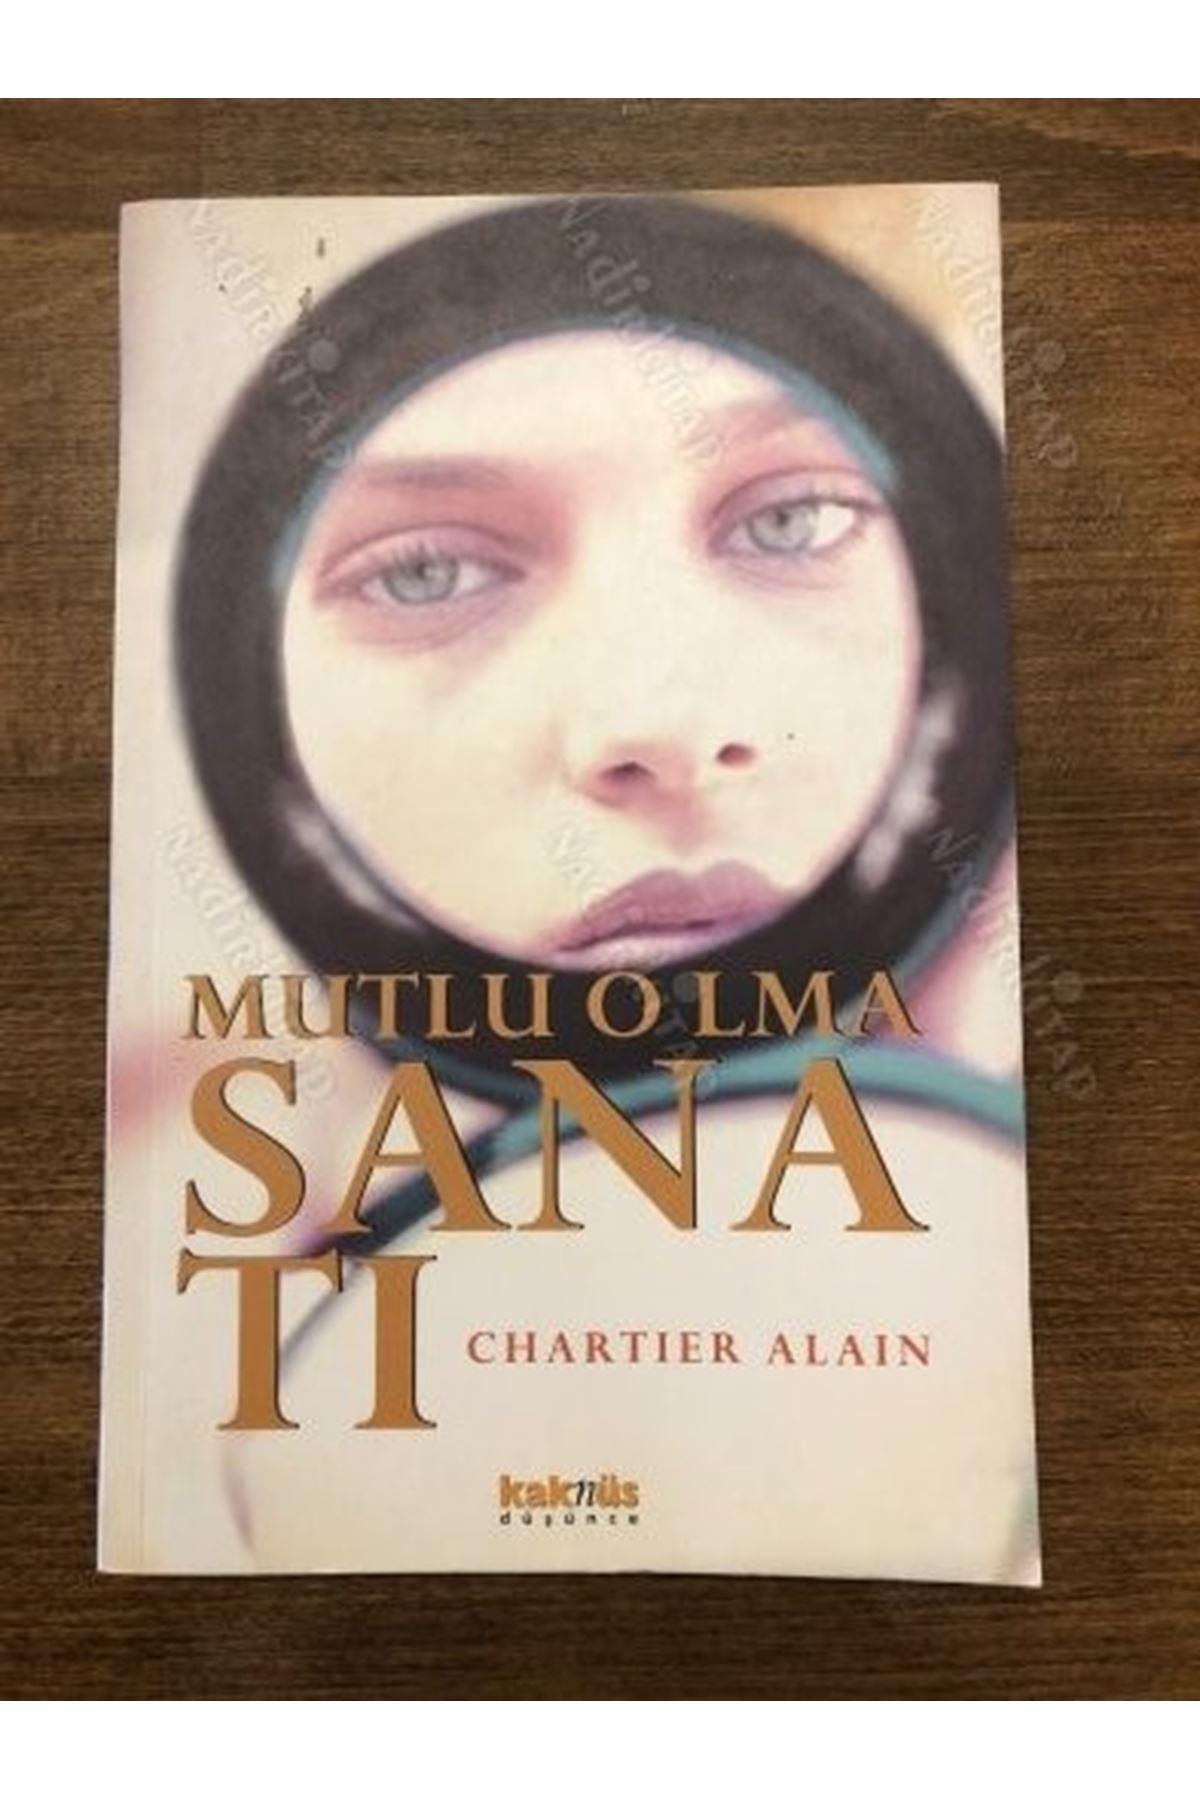 CHARTIER ALAIN - MUTLU OLMA SANATI